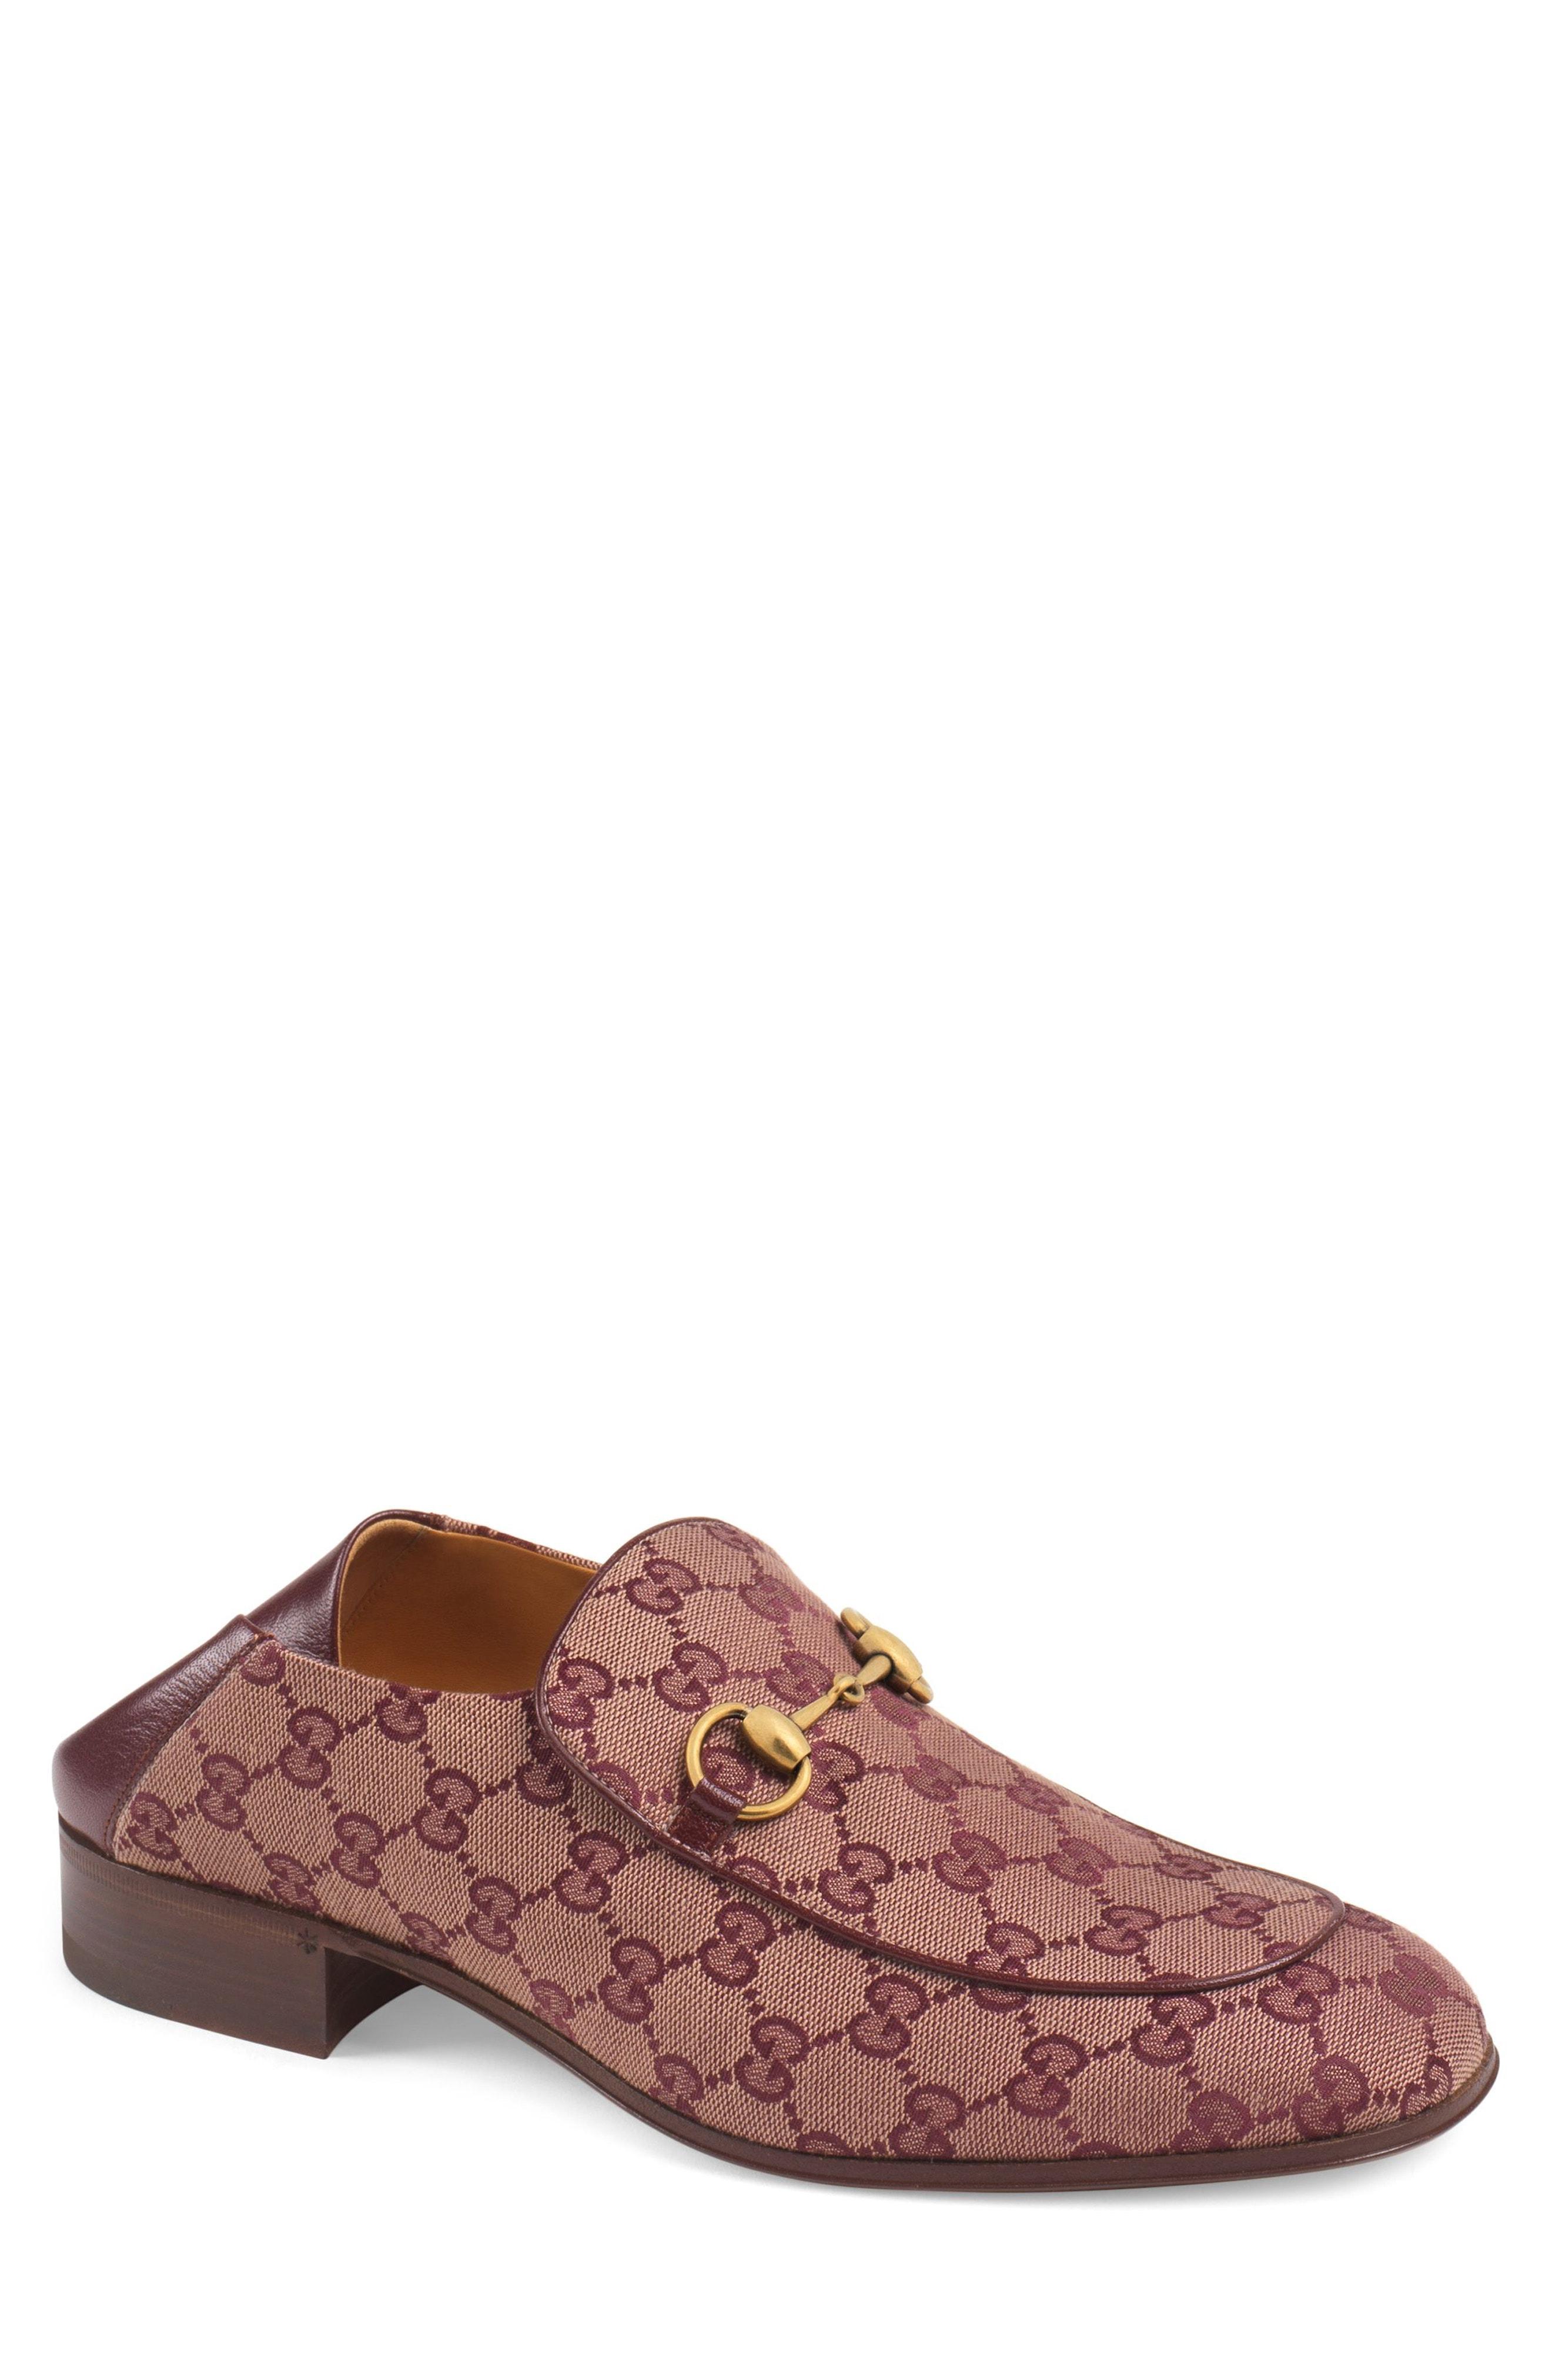 ca7d8e5fd3f Men s Gucci Mister Bit Loafer